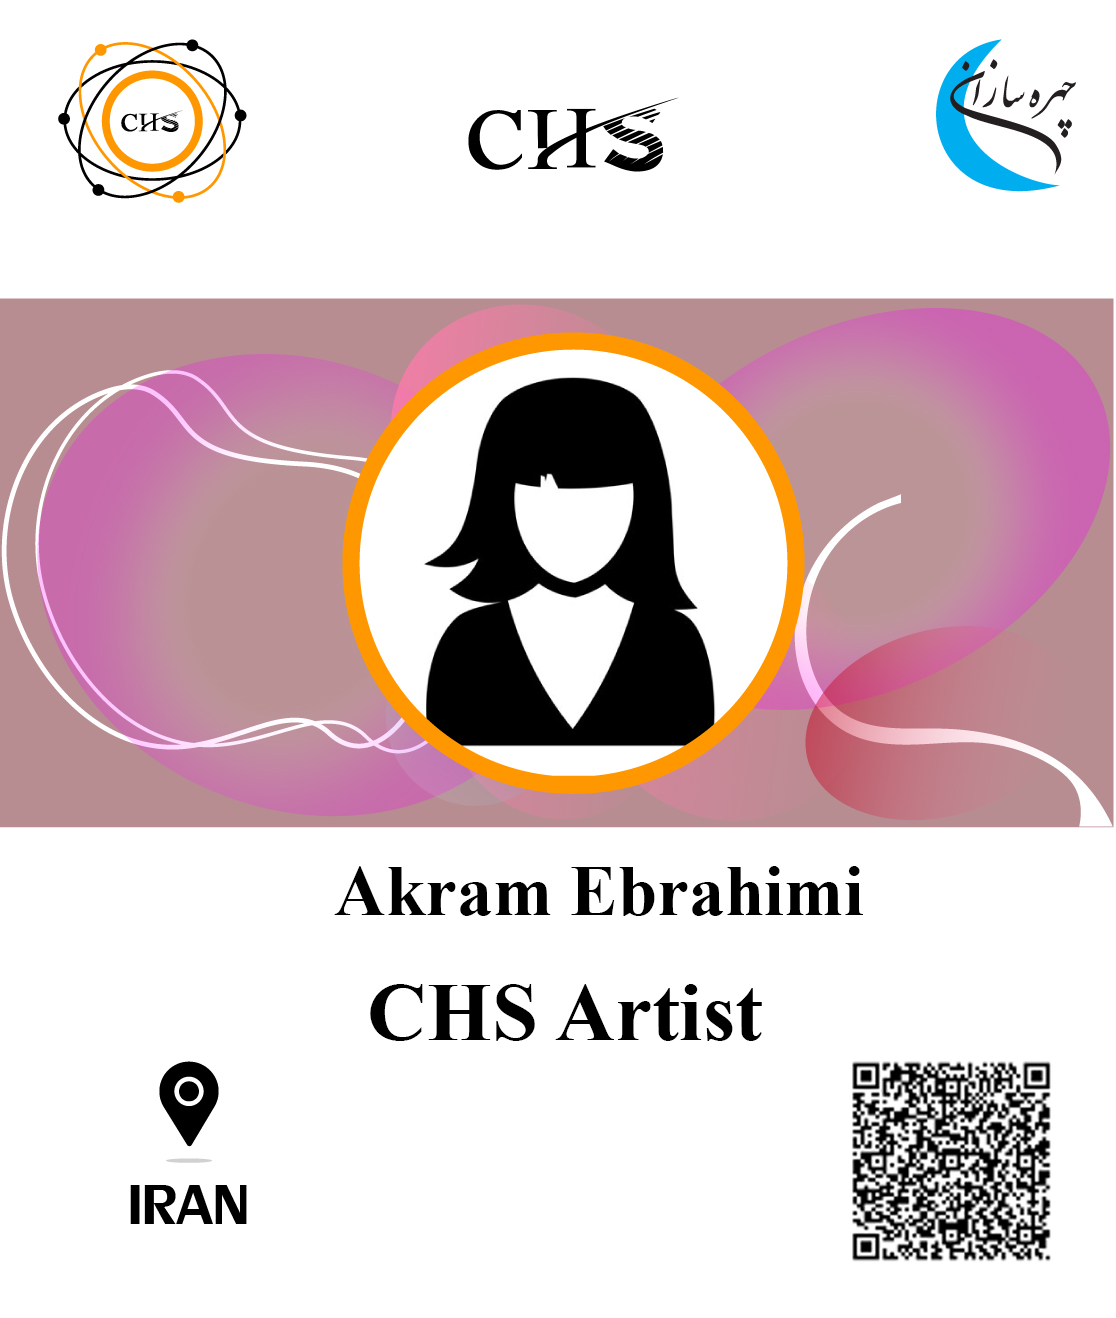 Akram Ebrahimi, Nail implants training certificate, Nail implants, Nail implants certificate, Nail implants training, Nail implants training Akram Ebrahimi , Nail implants certificate Akram Ebrahimi